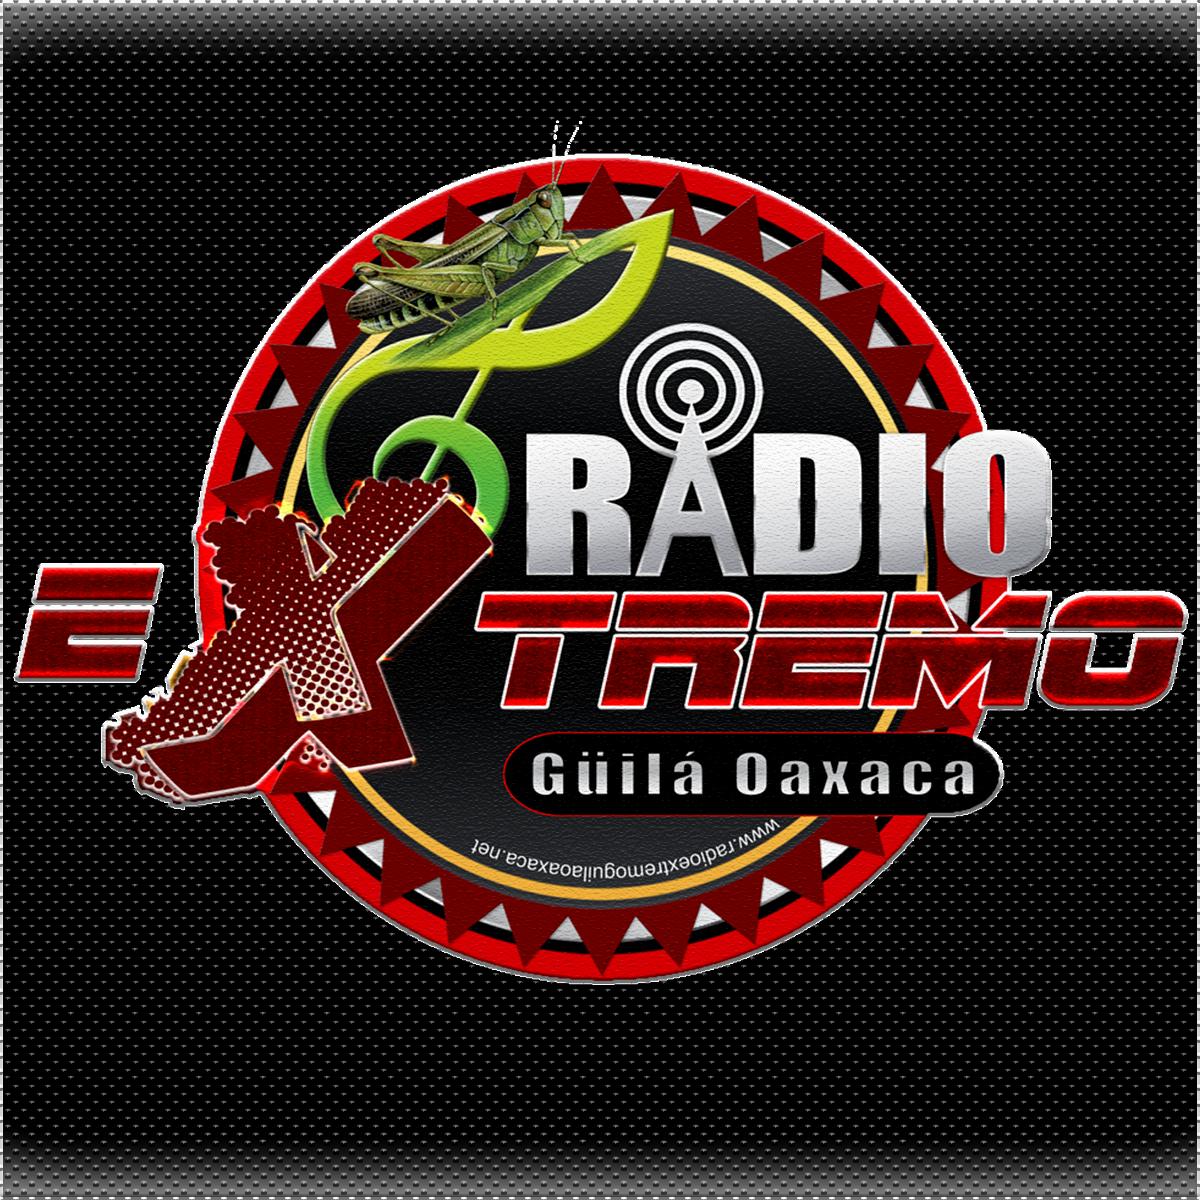 Extremo Guila Oaxaca